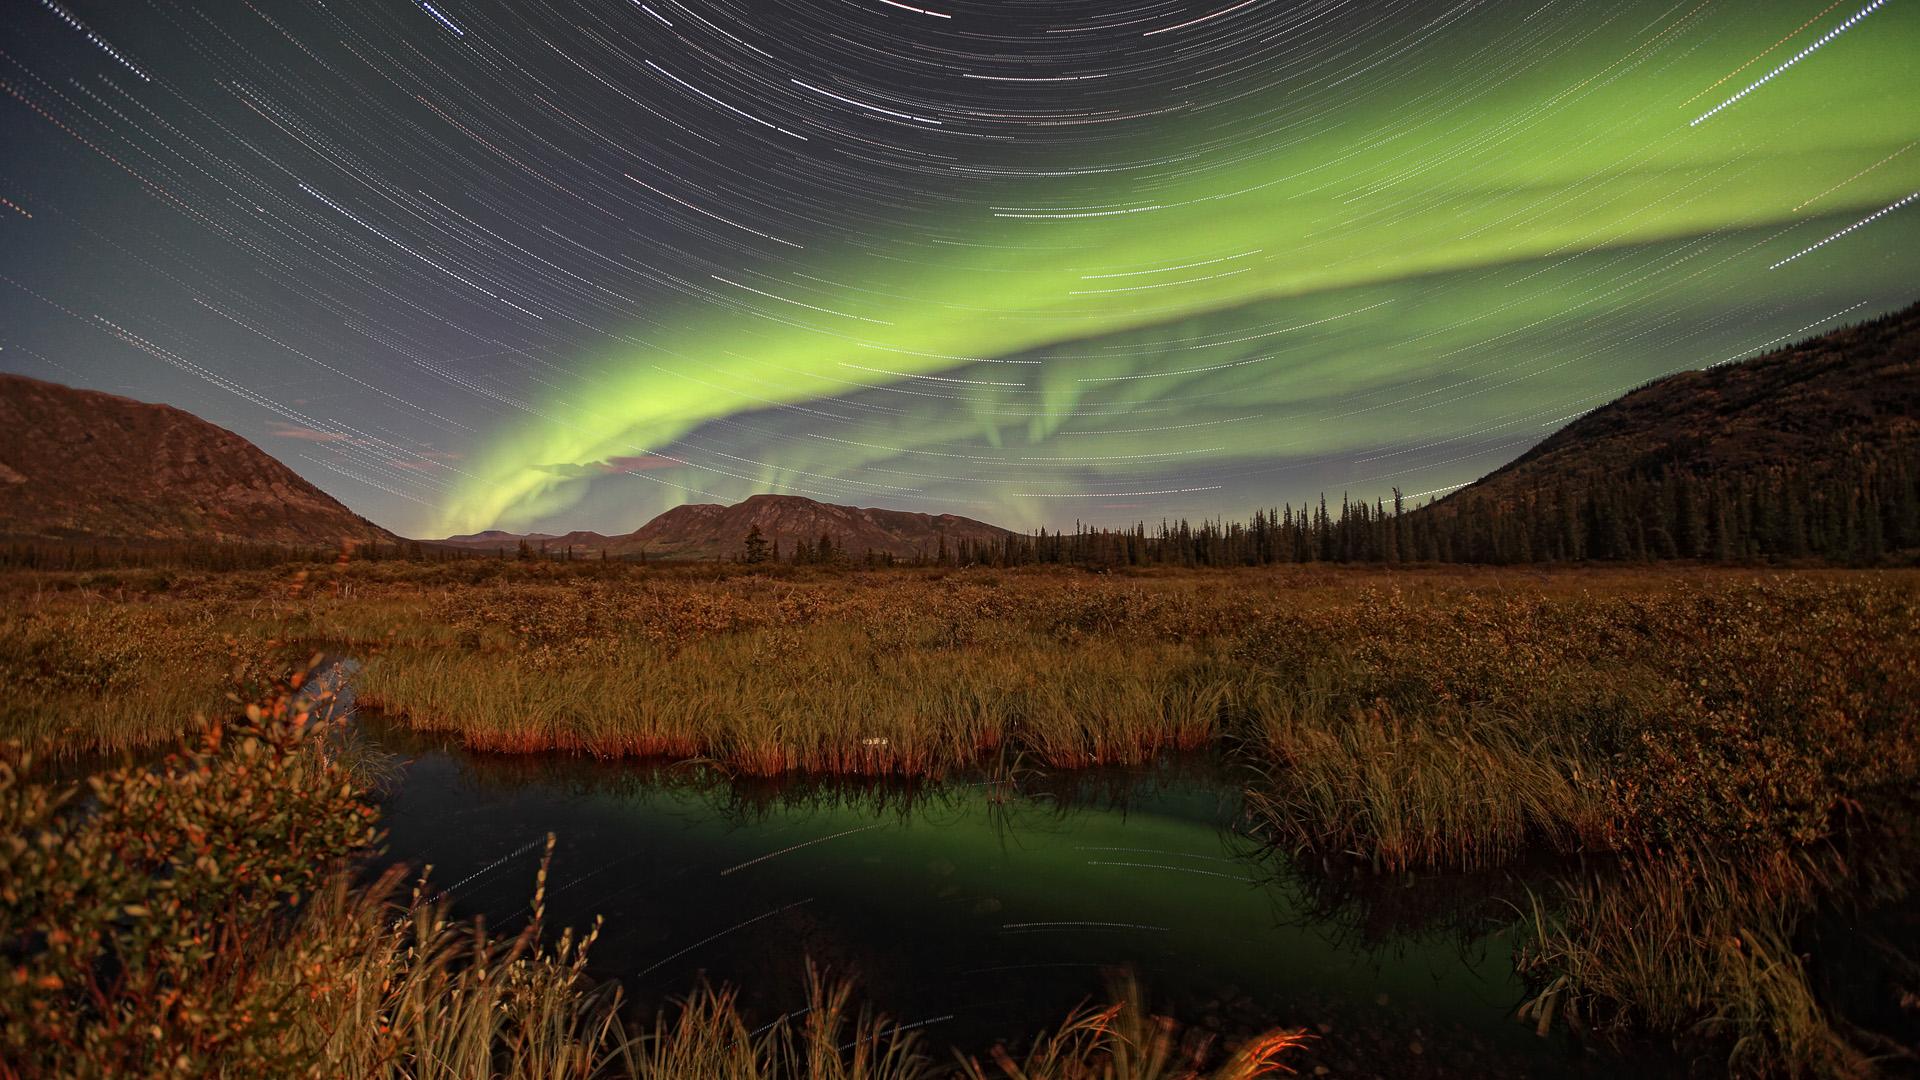 Star Trails and Aurora Borealis, Whitehorse, Yukon Full HD ...